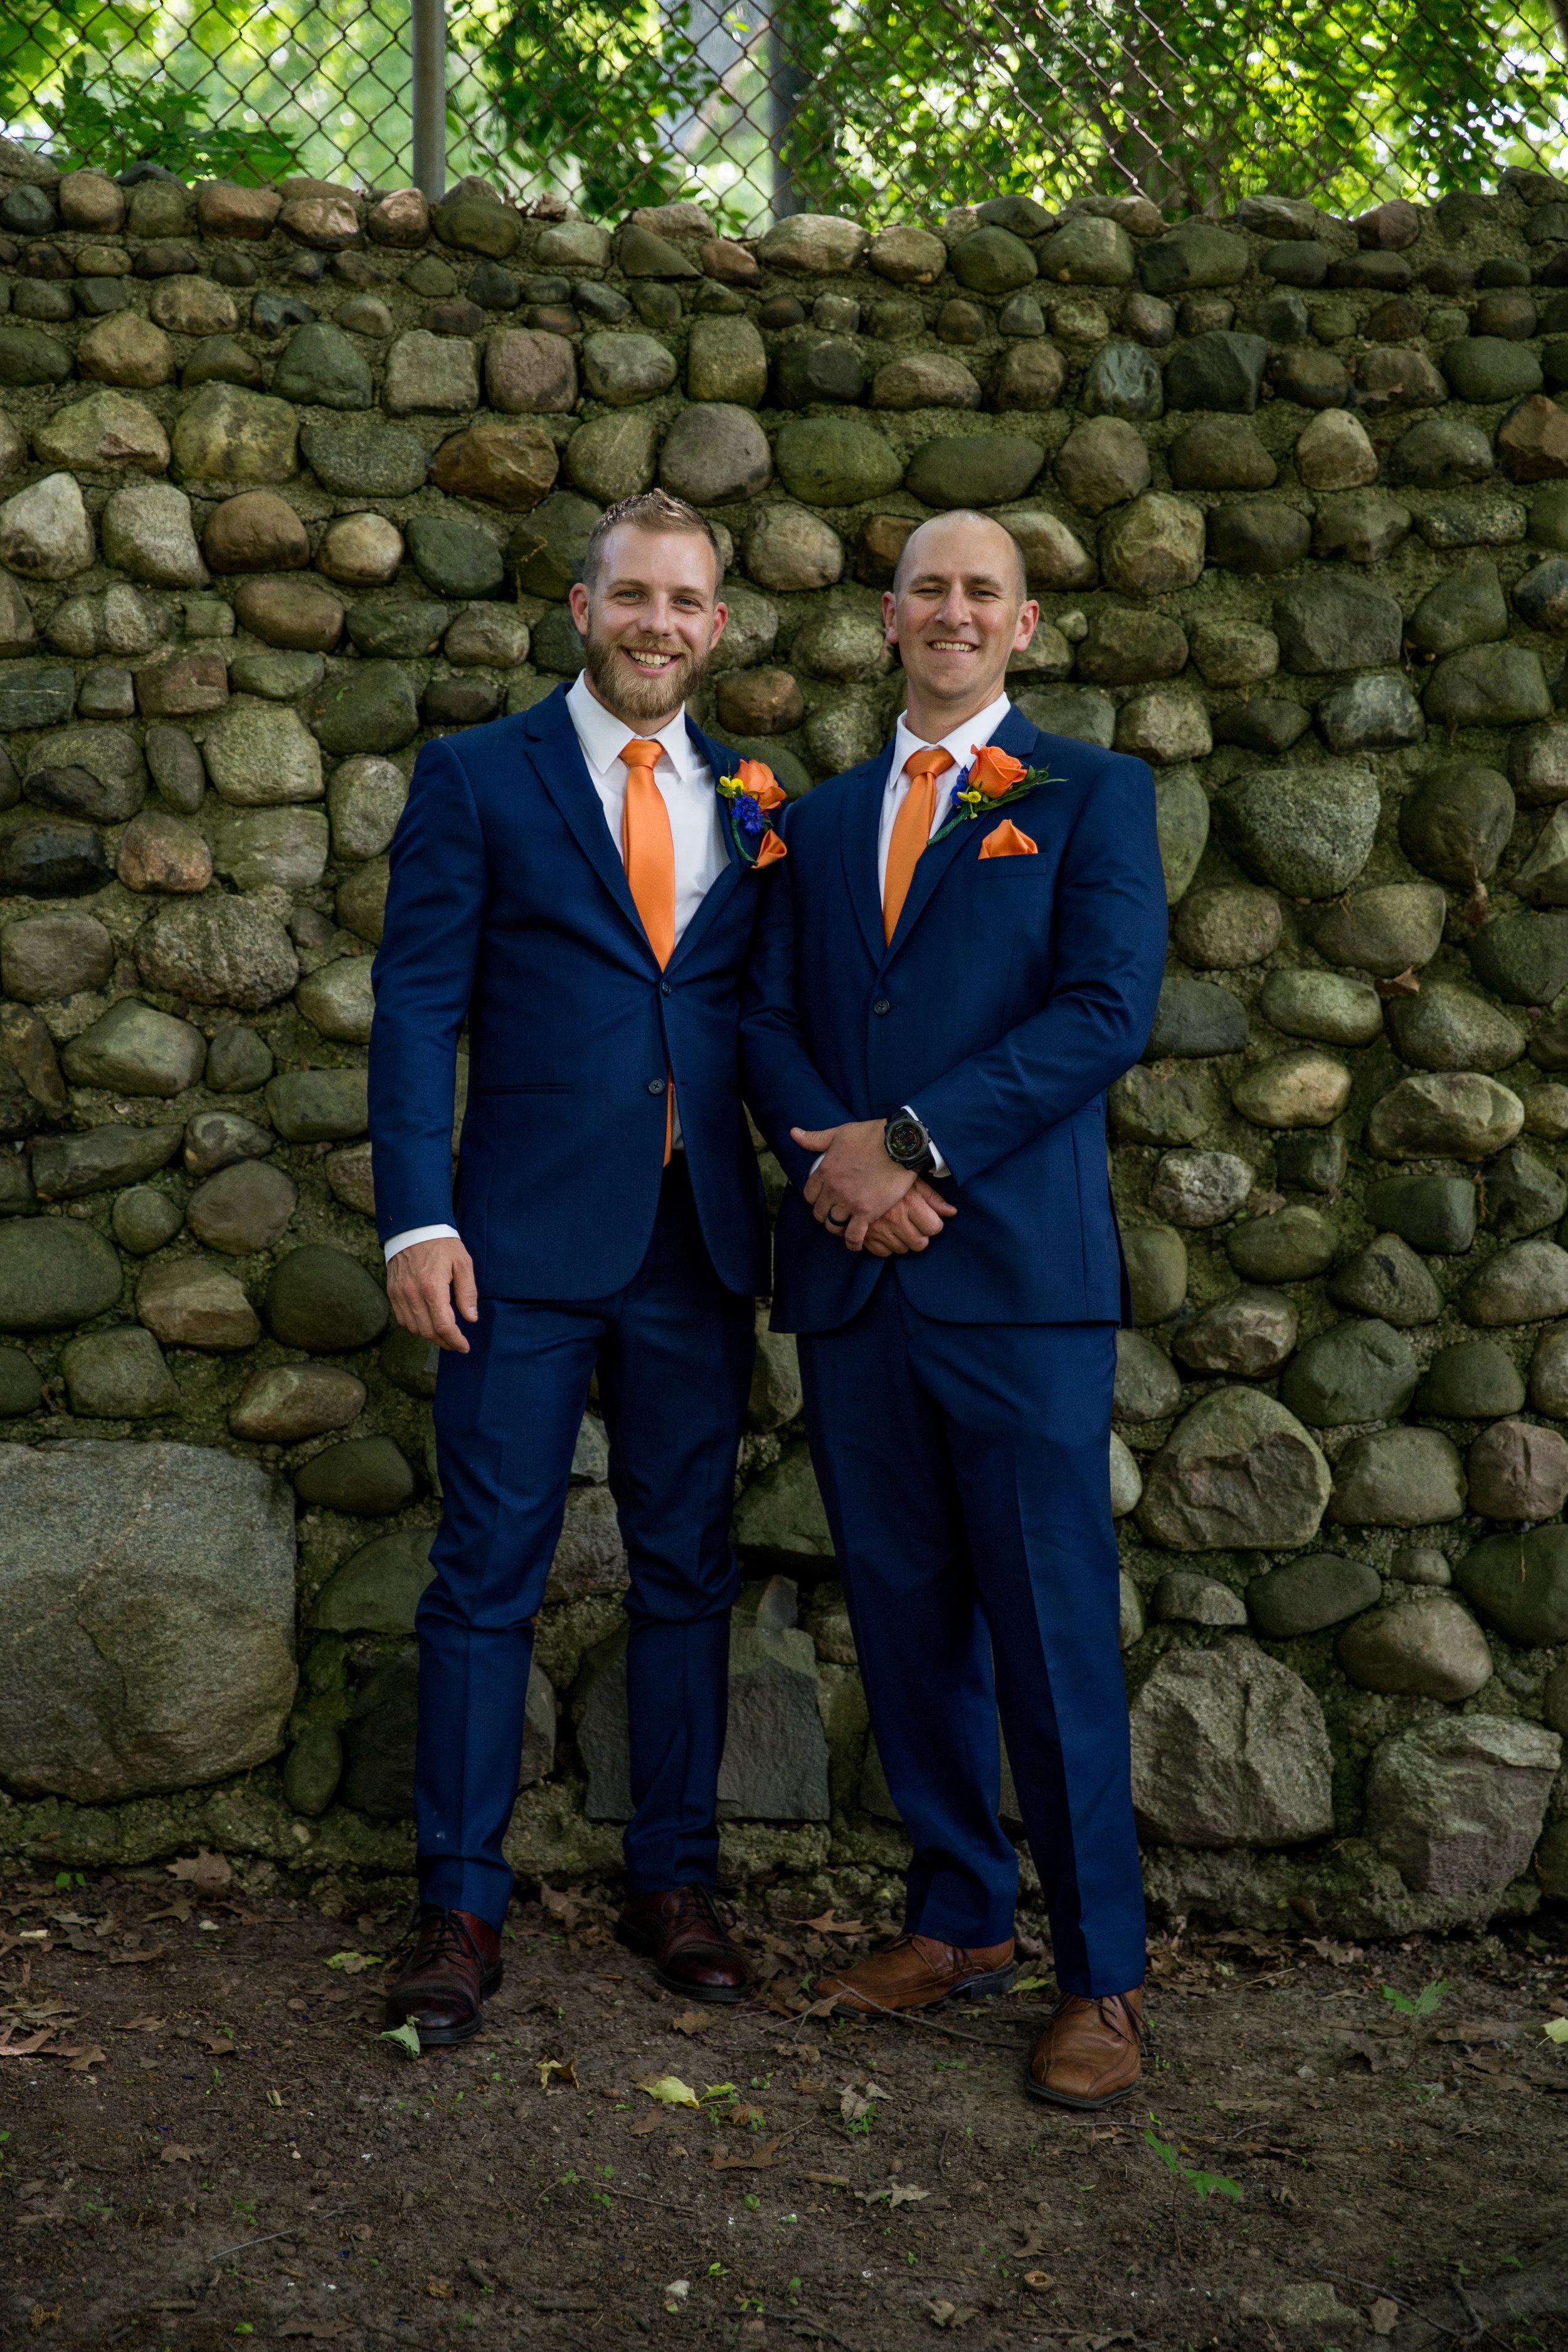 Natalie and Dallas Mooney Wedding 6-8-19_Tania Watt Photography-324.jpg